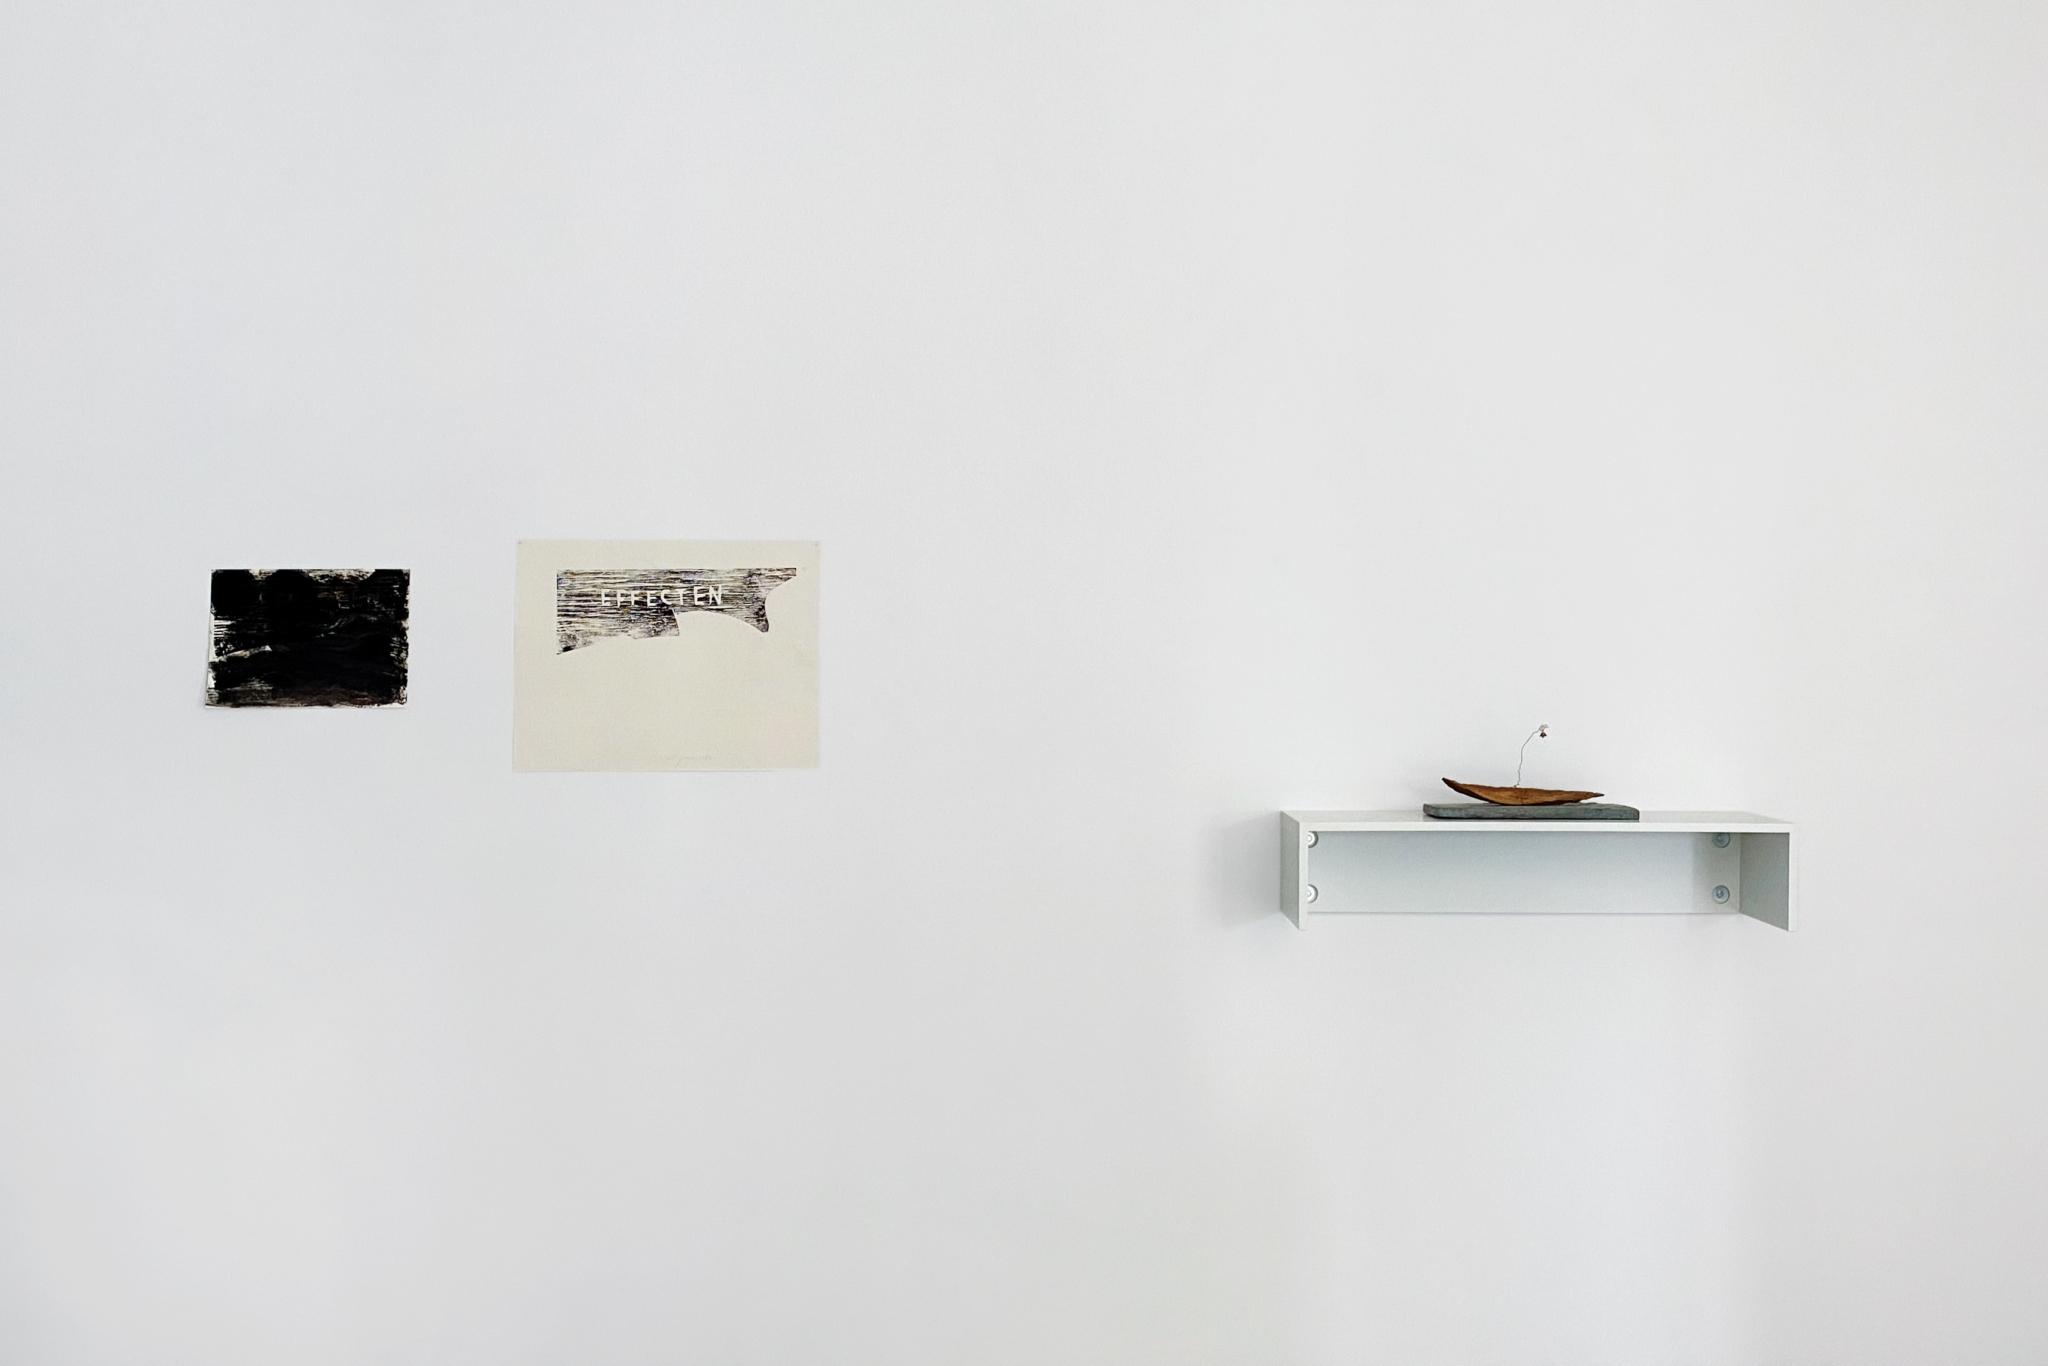 Banner druksels foto zonder tekst 2